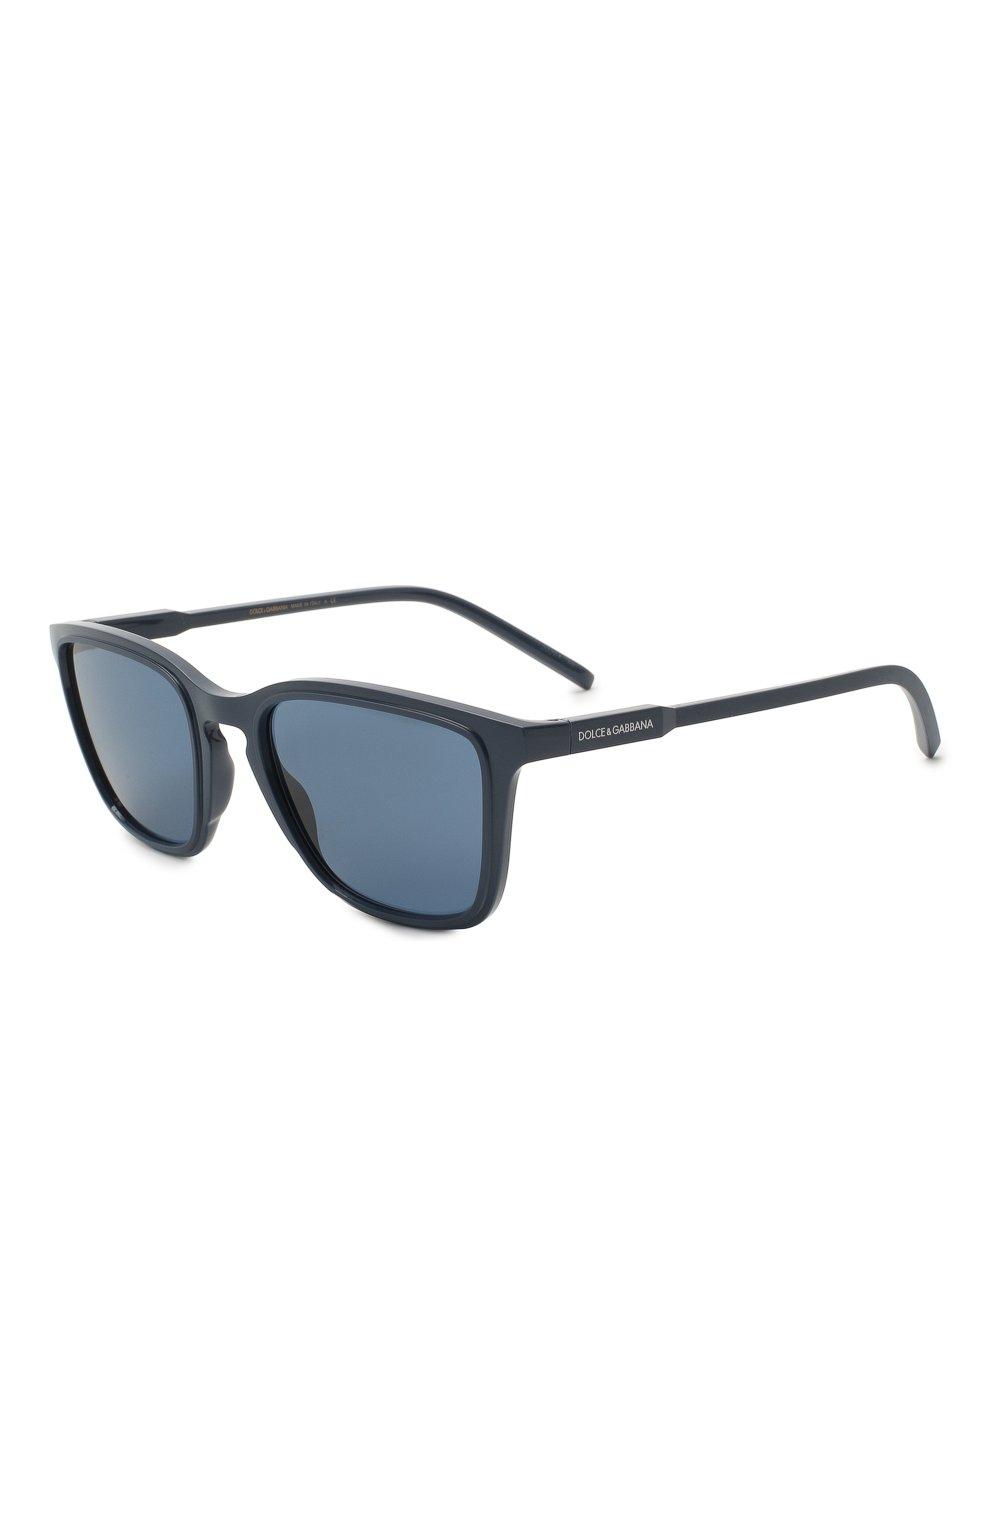 Мужские солнцезащитные очки DOLCE & GABBANA синего цвета, арт. 6145-329480   Фото 1